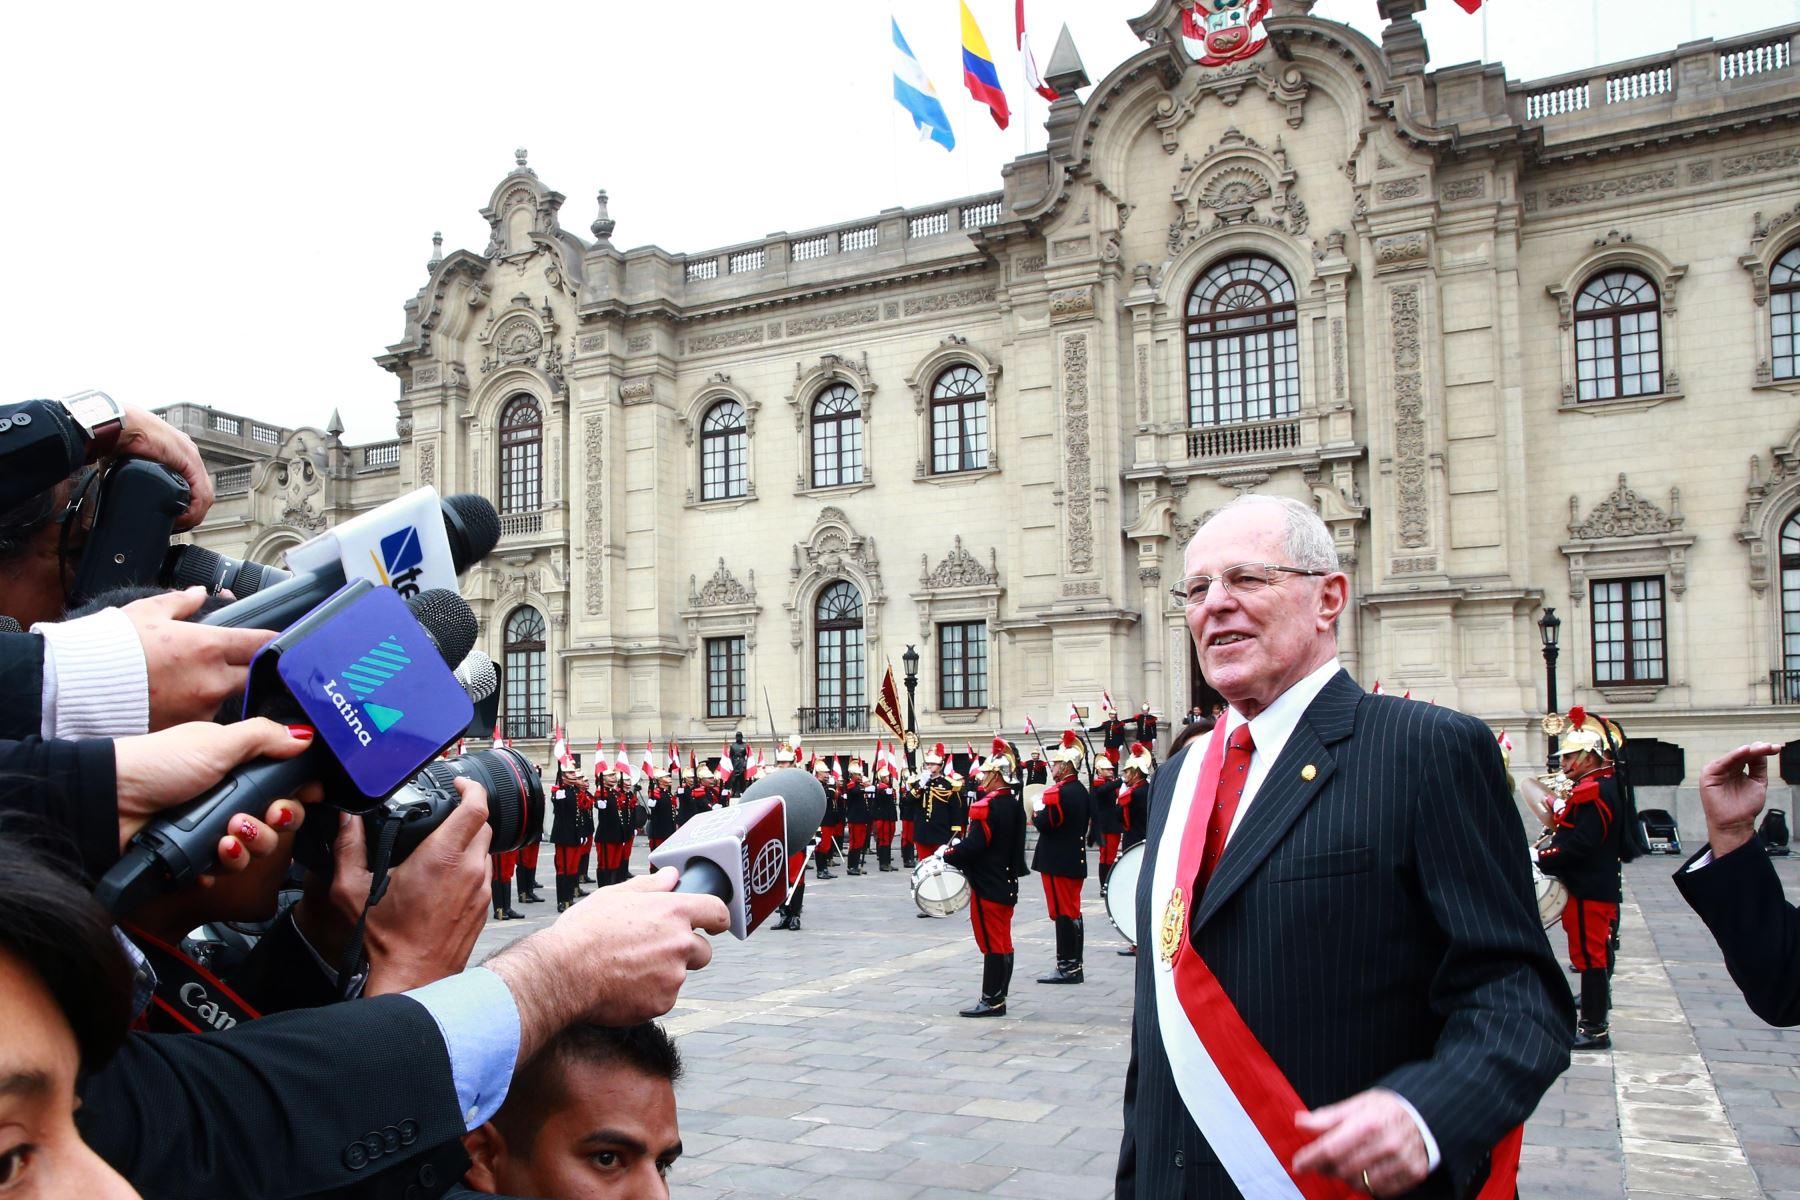 LIMA, PERÚ - JULIO 28. El presidente Pedro Pablo Kuczynski hace su ingreso a Palacio de Gobierno. Foto: Andina /Prensa Presidencia